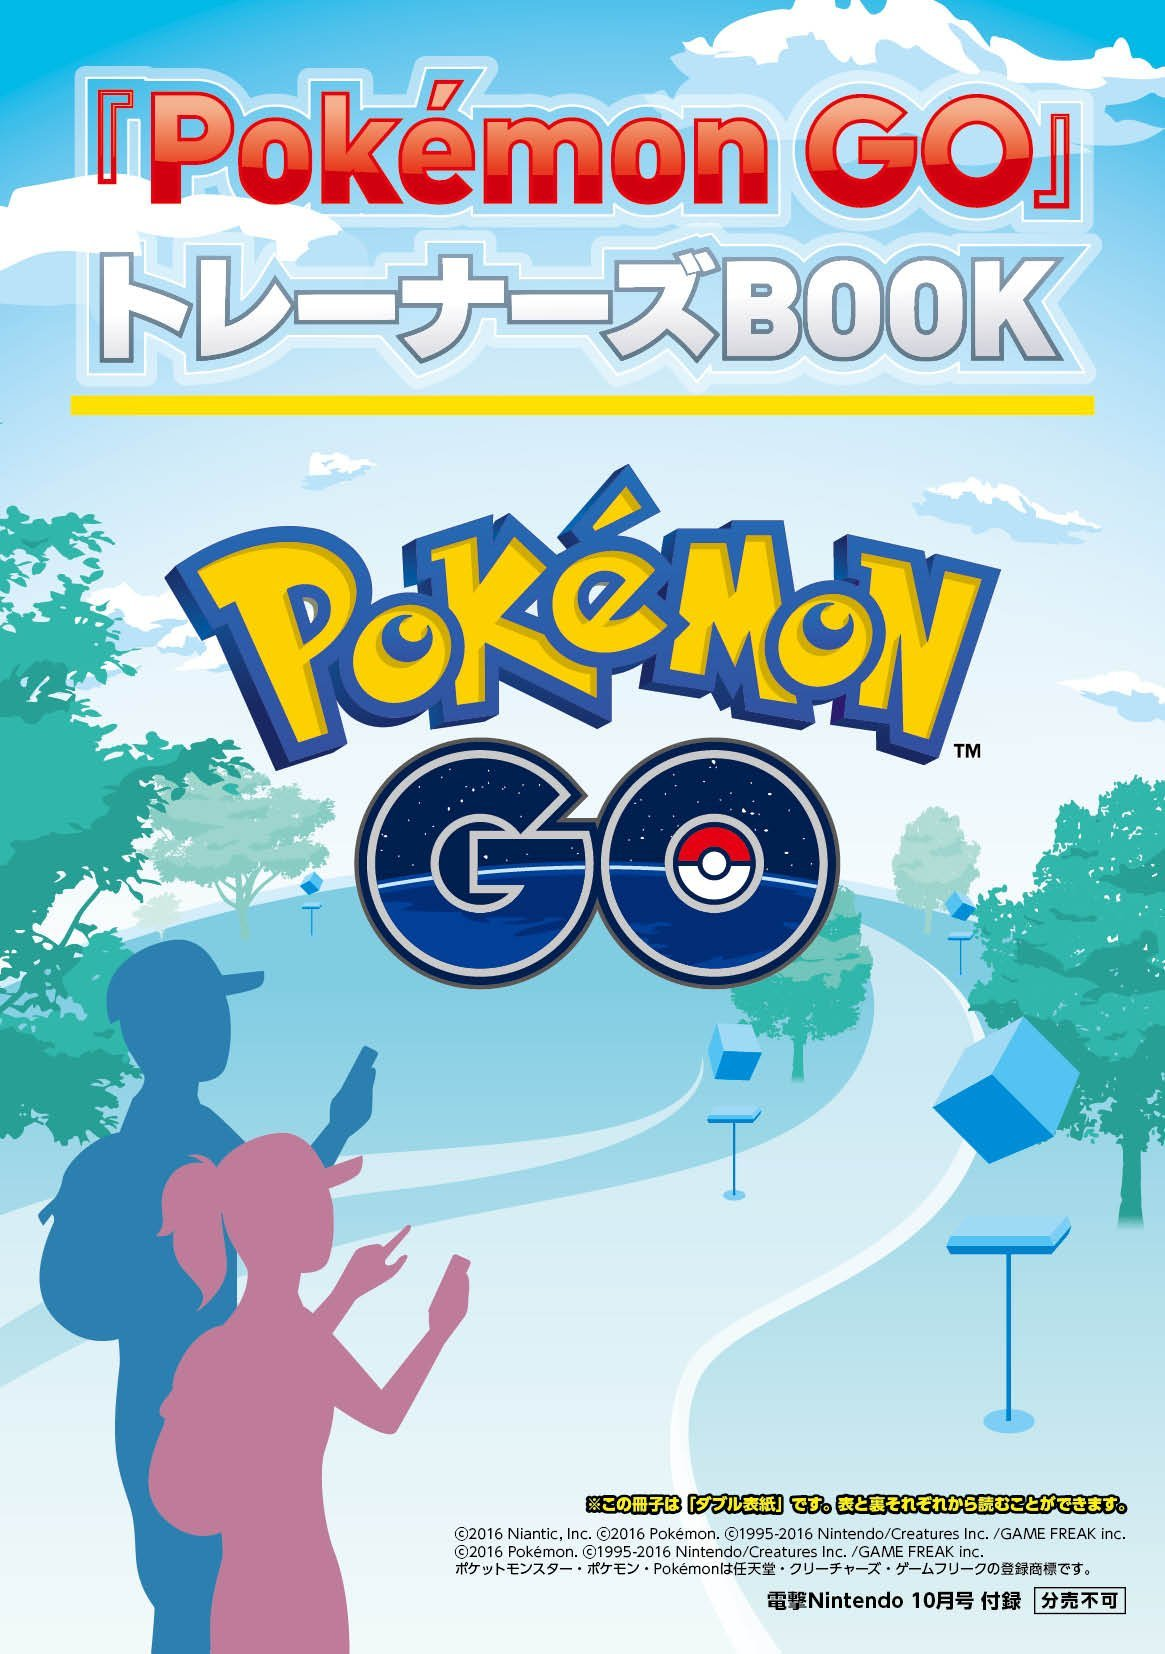 Pokemon Go Trainer's Book (issue 41 supplement) (October 2016)